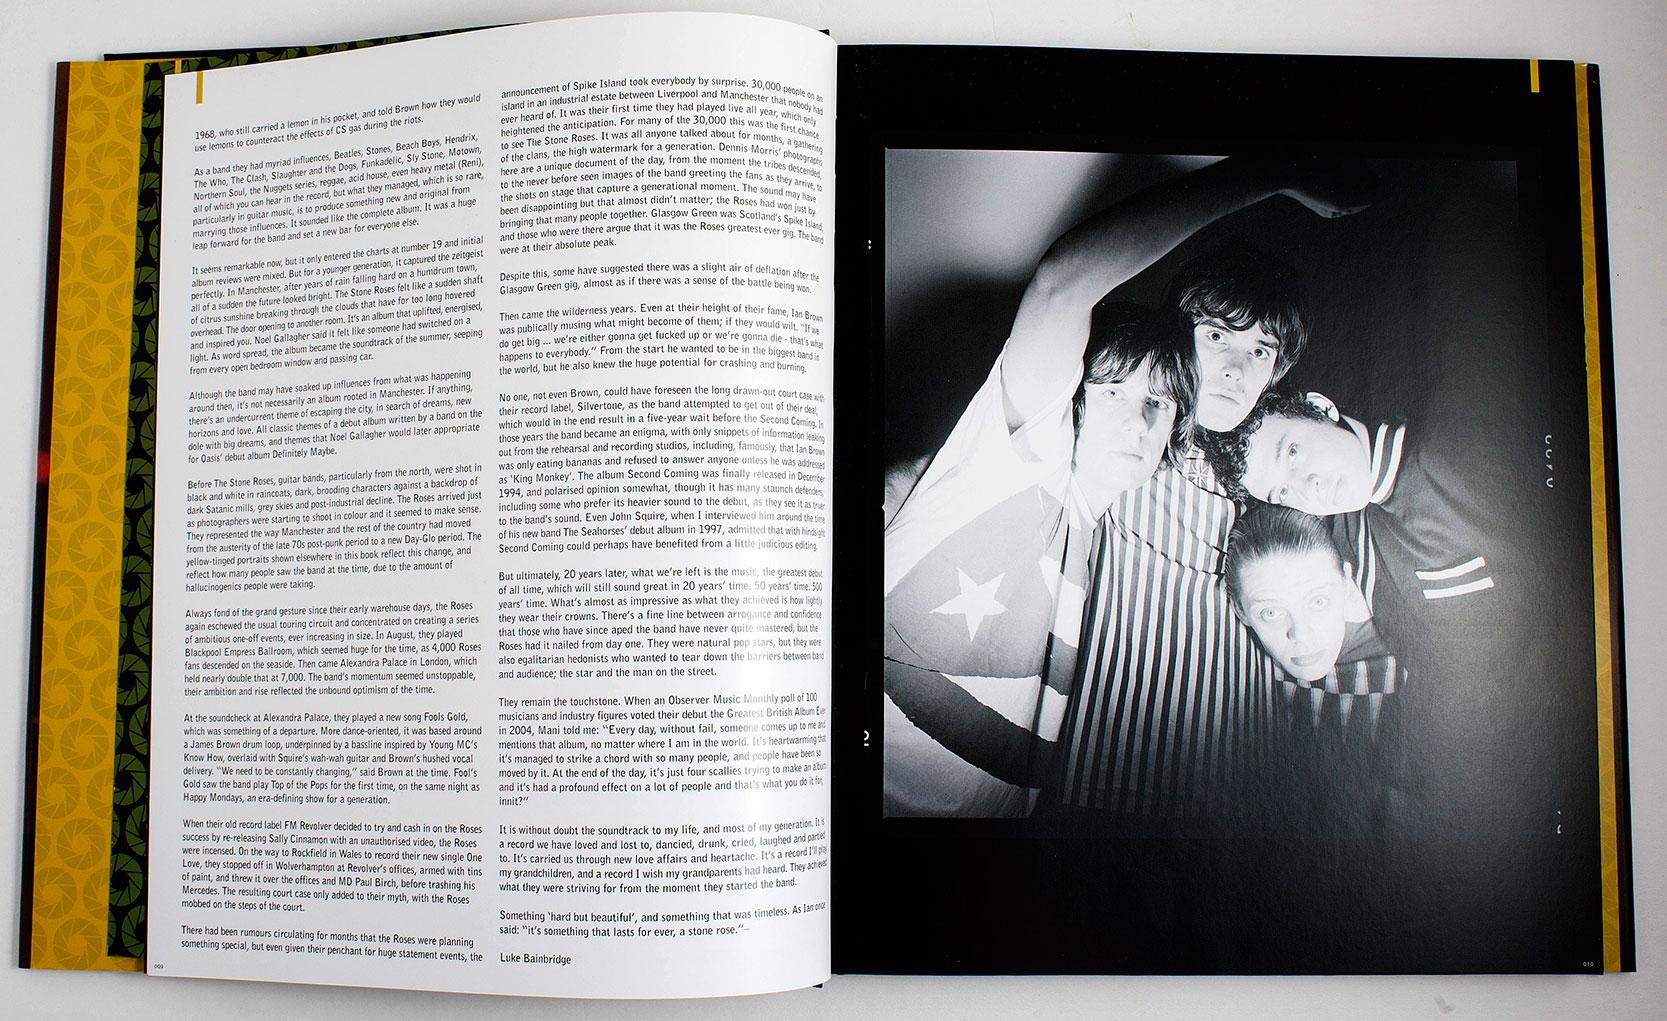 epm-print-management-bristol-photography-books-7.jpg